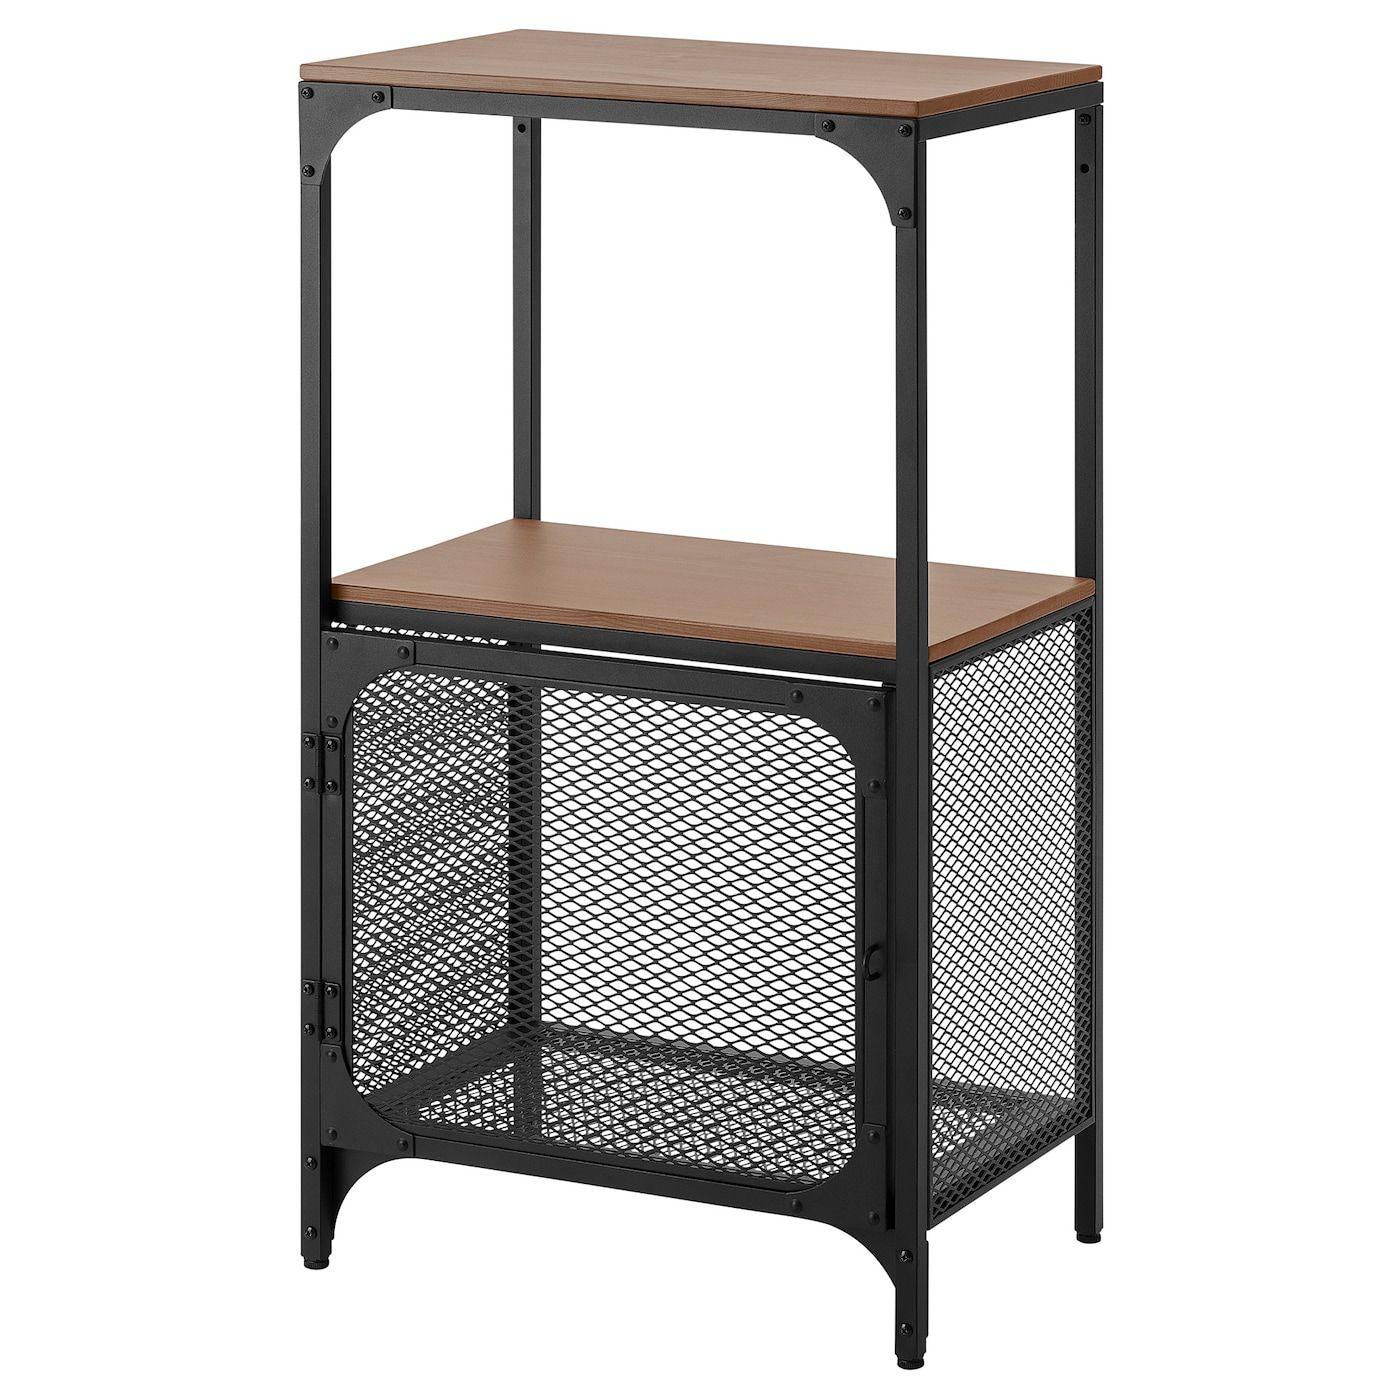 FjÄllbo Shelf Unit Black 20 1 8x37 3